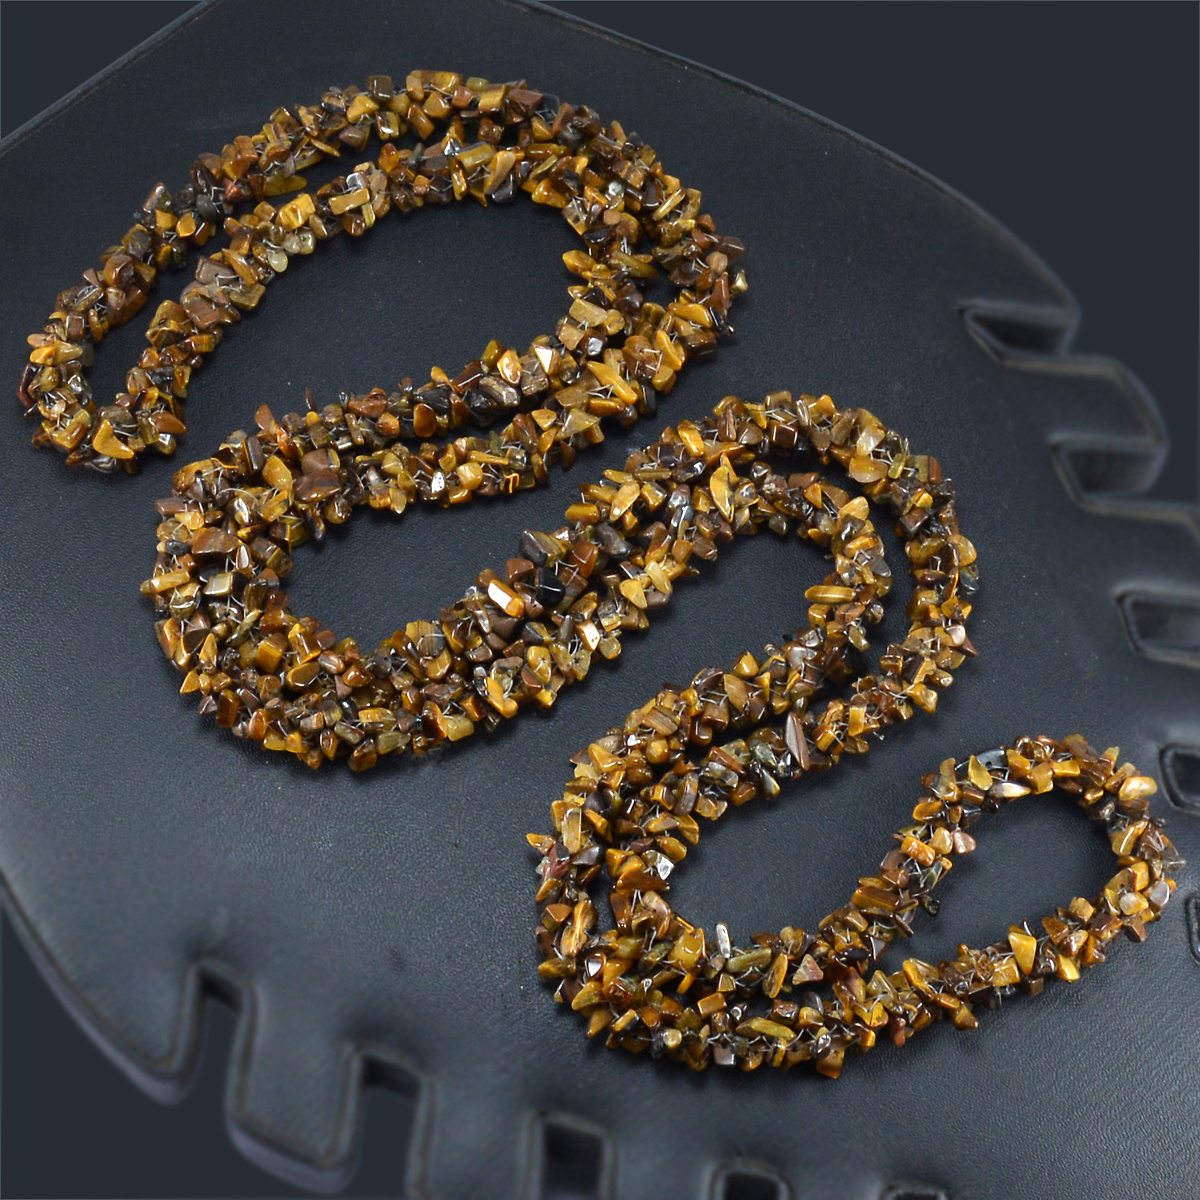 Tiger Eye Gemstone Chips Necklace PG-156064